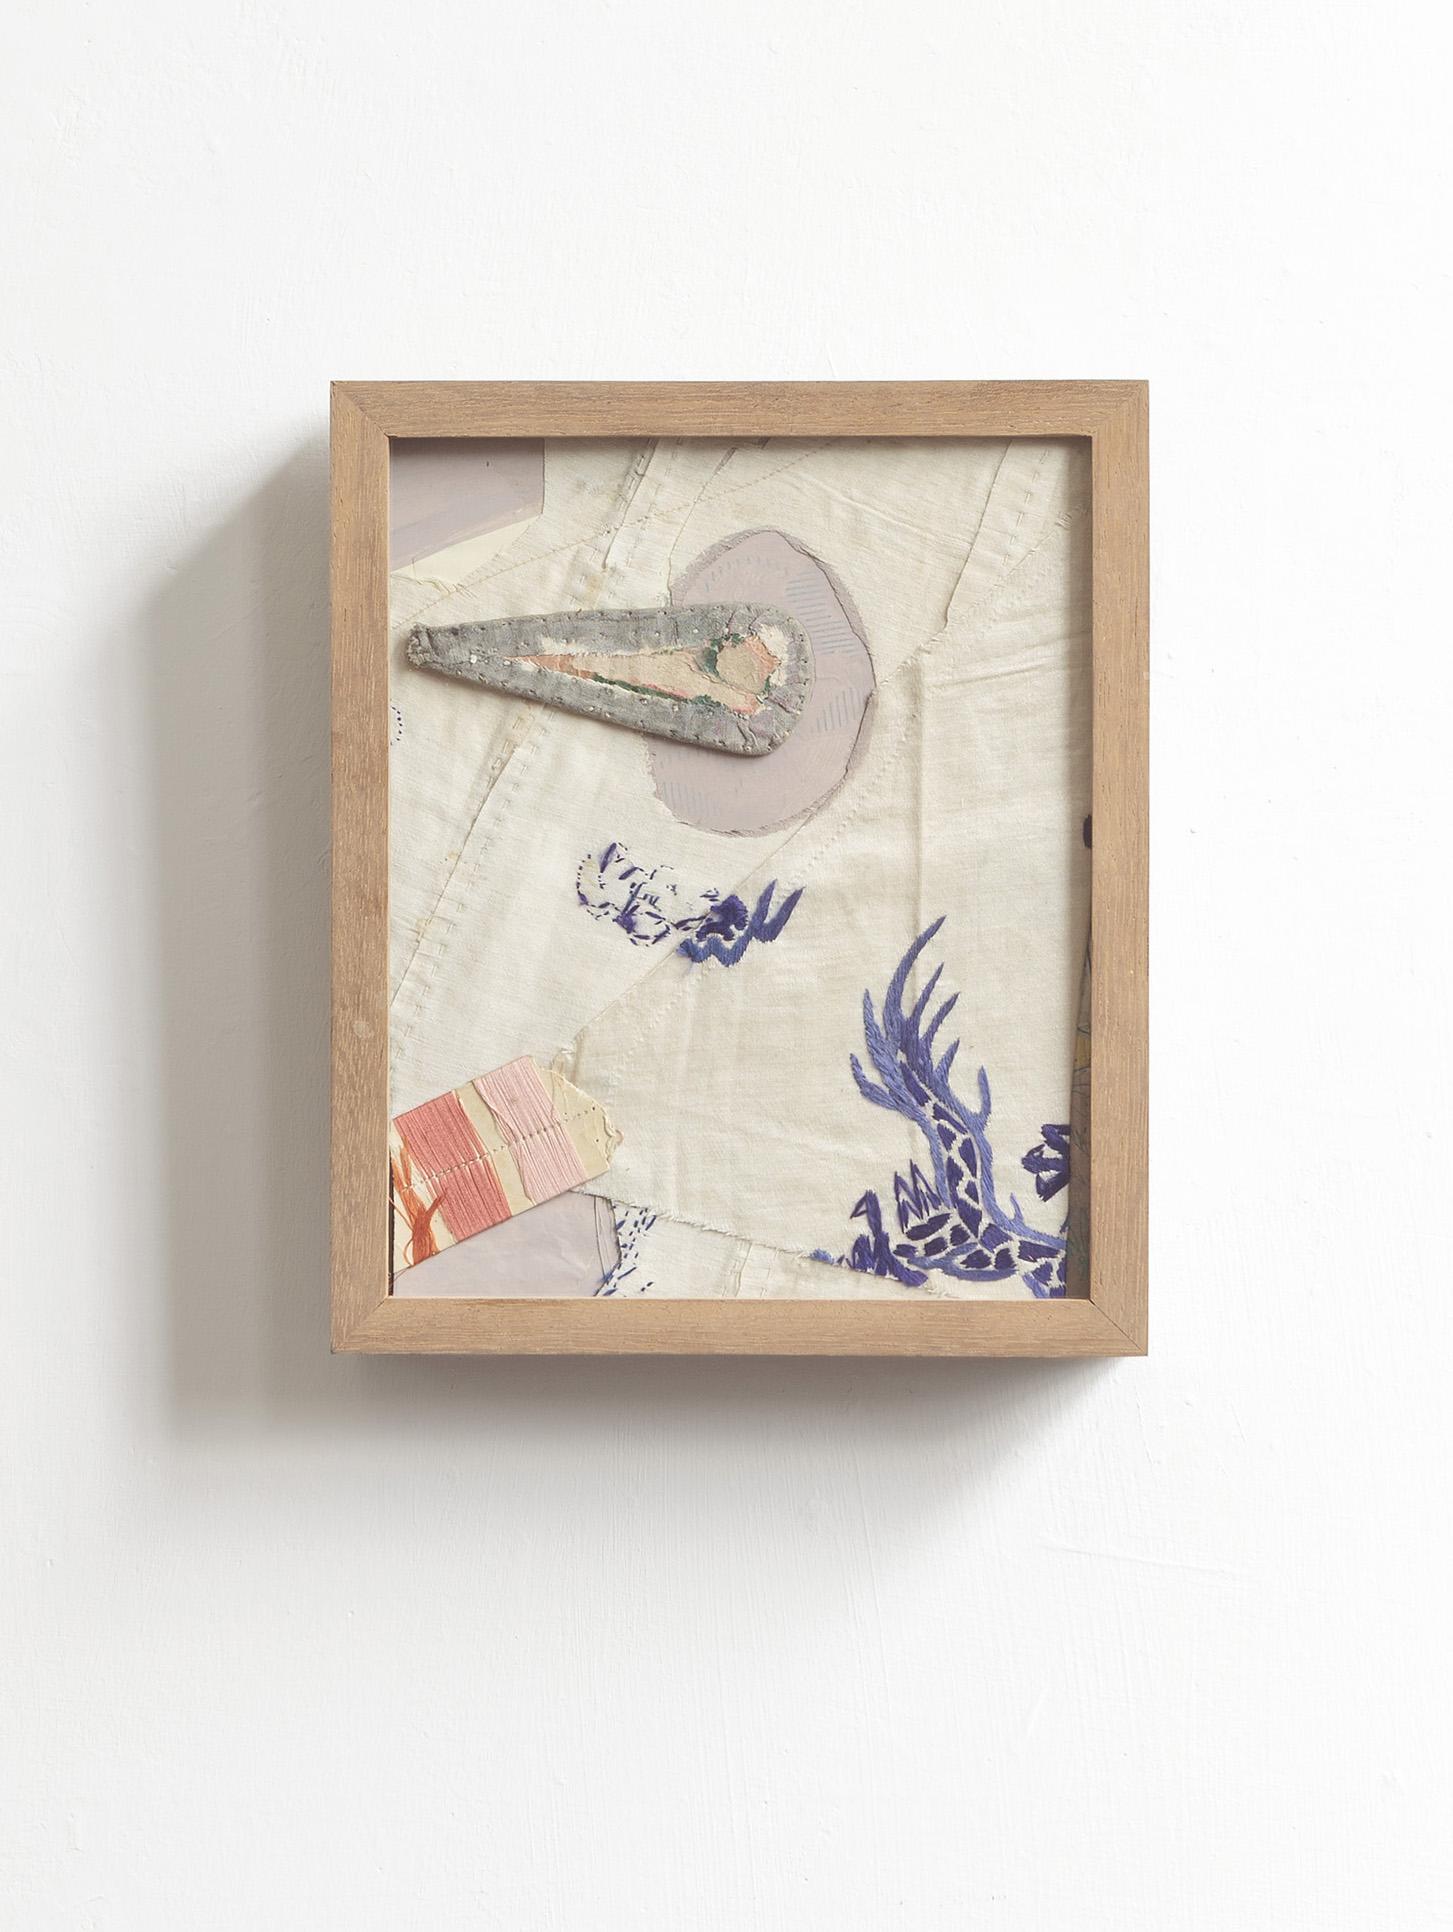 Profile  2017 - fabric and mixed media on wood - cm 24x20x5  Foto Nicola Belluzzi